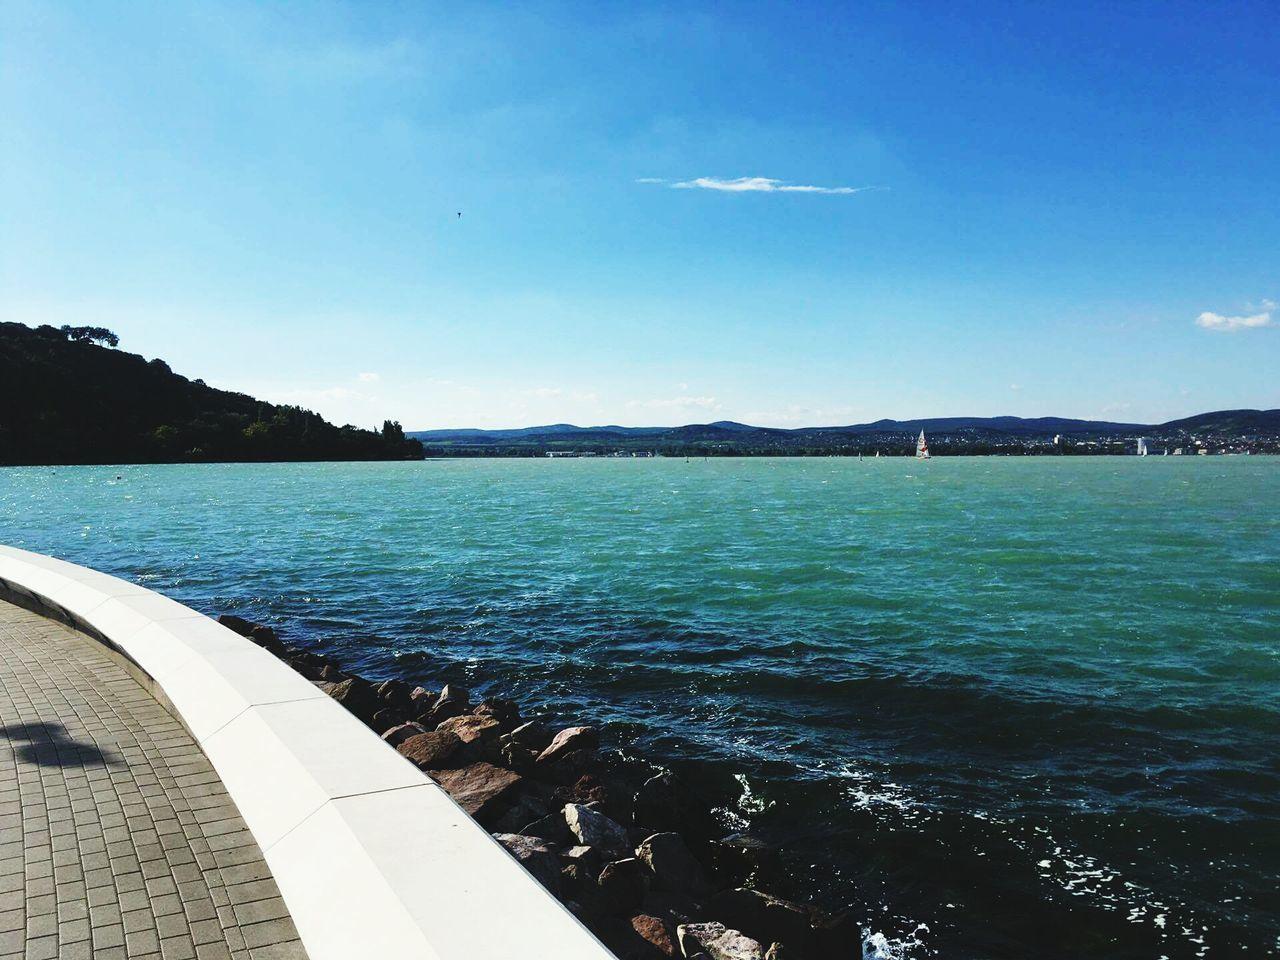 Water Vacations Sky Beach No People Balaton Lake Ilovethisplace Holiday Trip